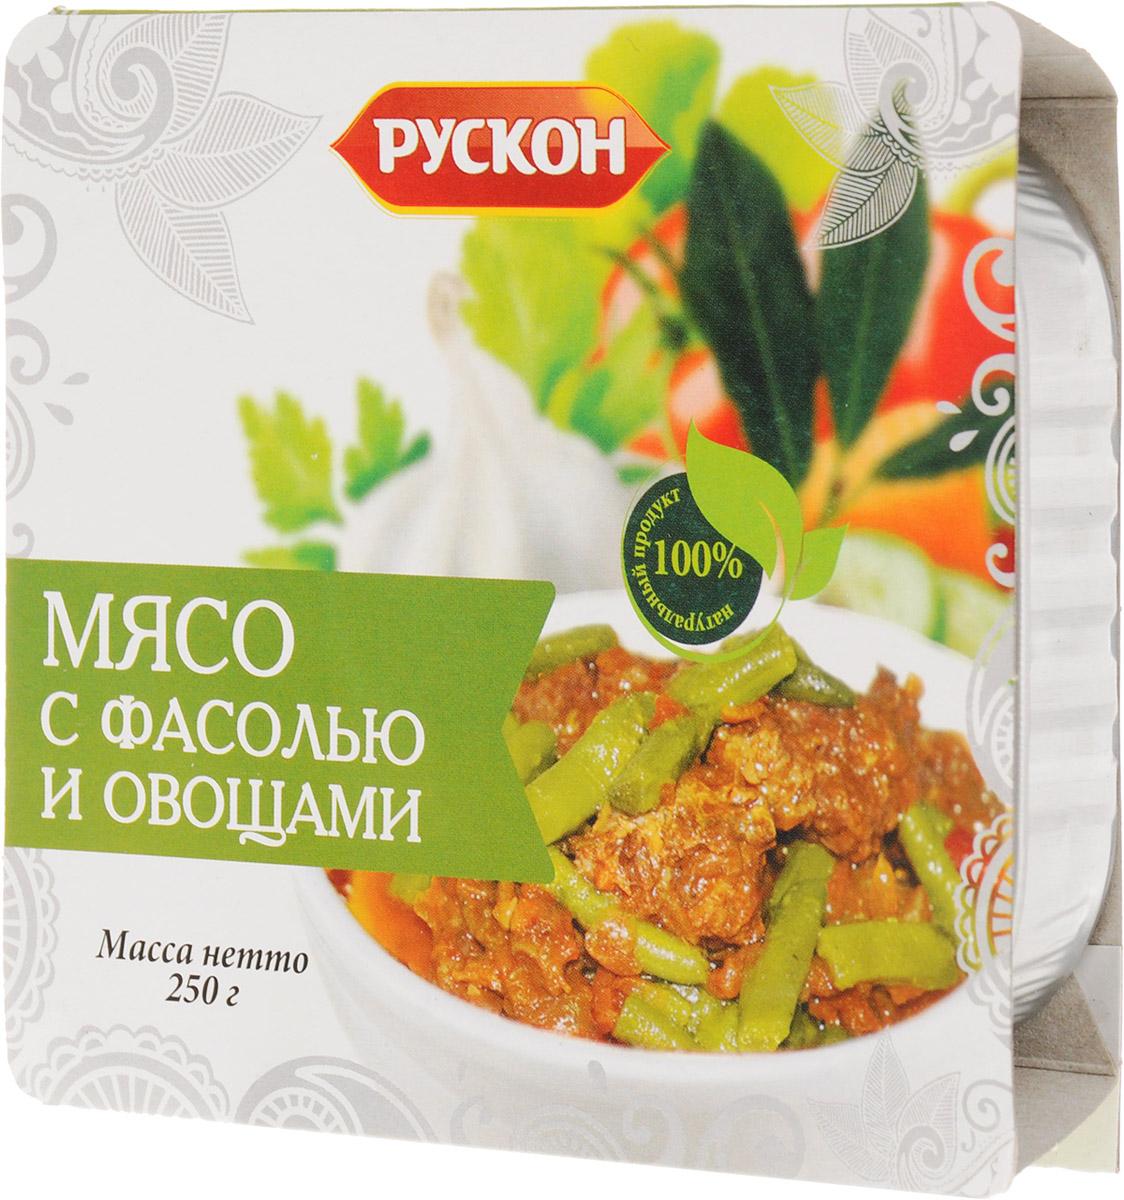 Рускон мясо с фасолью и овощами, 250 г мясо